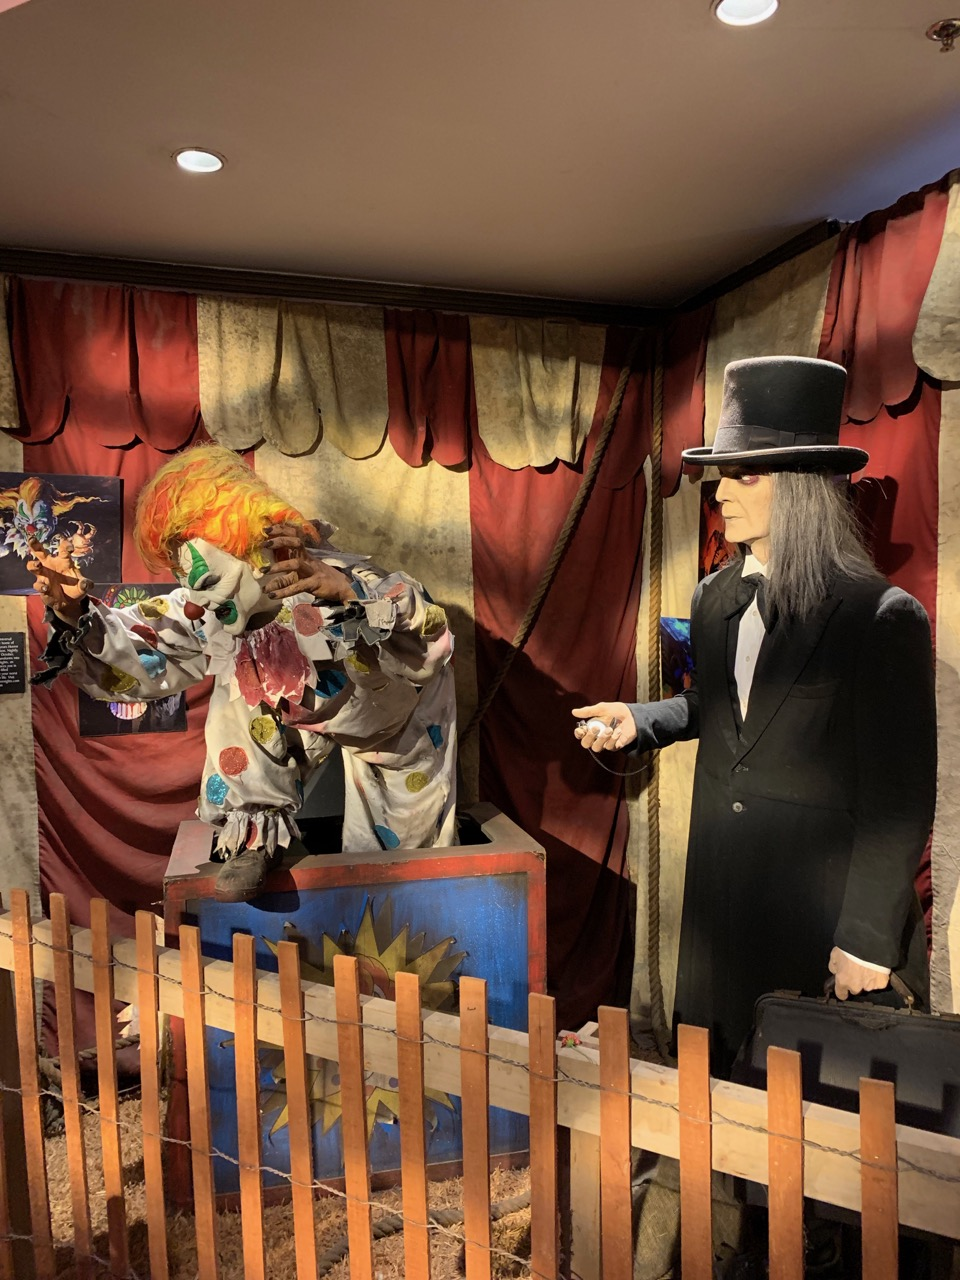 universal orlando summer 2019 trip report part 3 horror display.jpeg